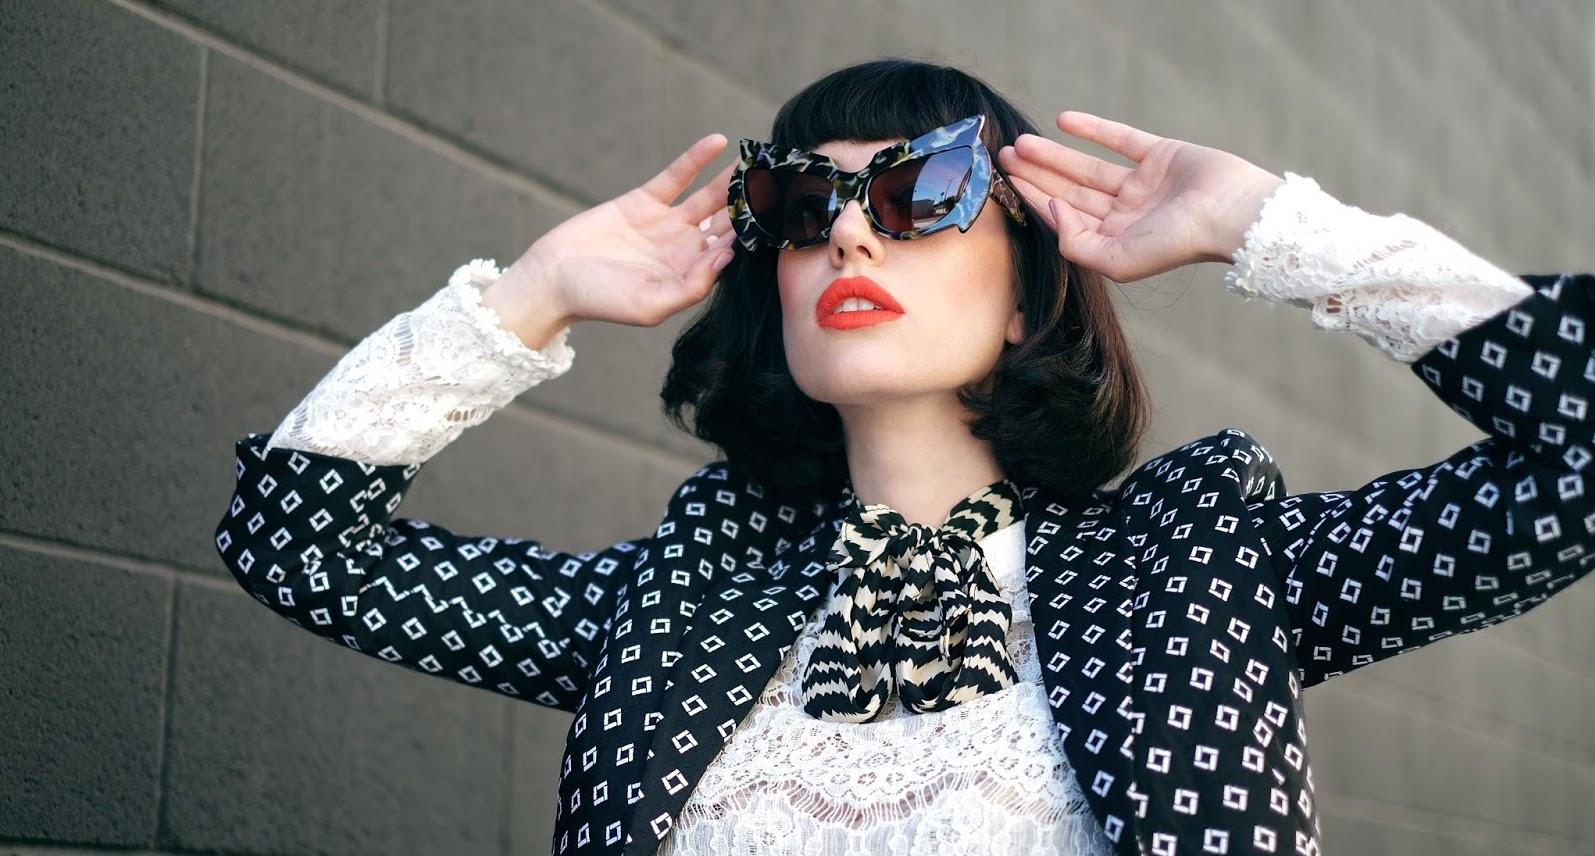 Amy Roiland (@fashionnerd) in Mantis